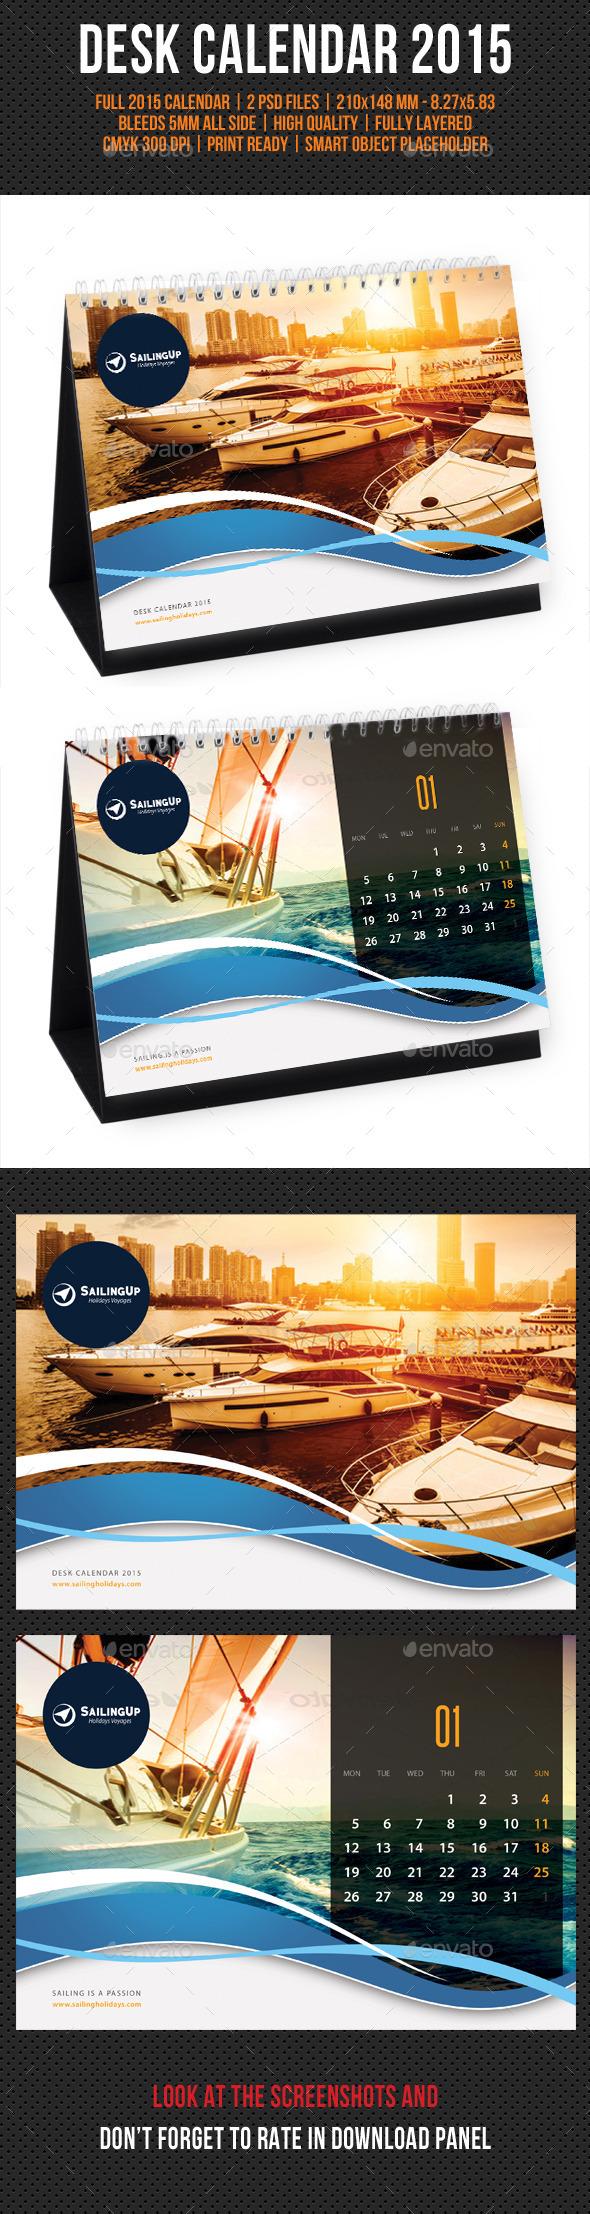 Creative Desk Calendar 2015 V08